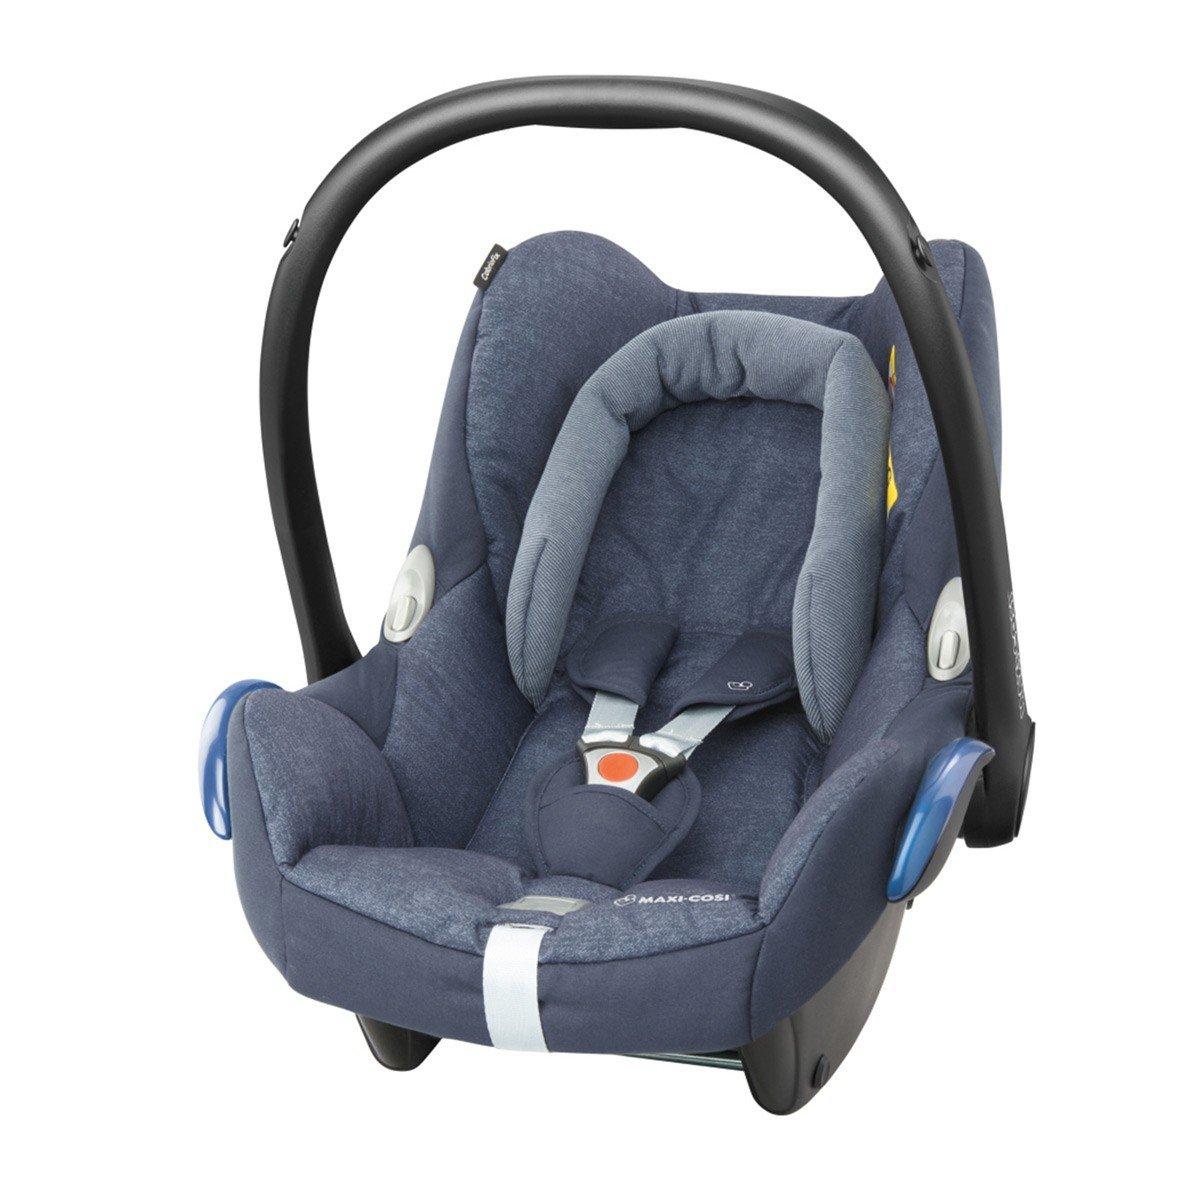 MAXI COSI CABRIOFIX Nomad Blue Bērnu autosēdeklis 0-13 kg